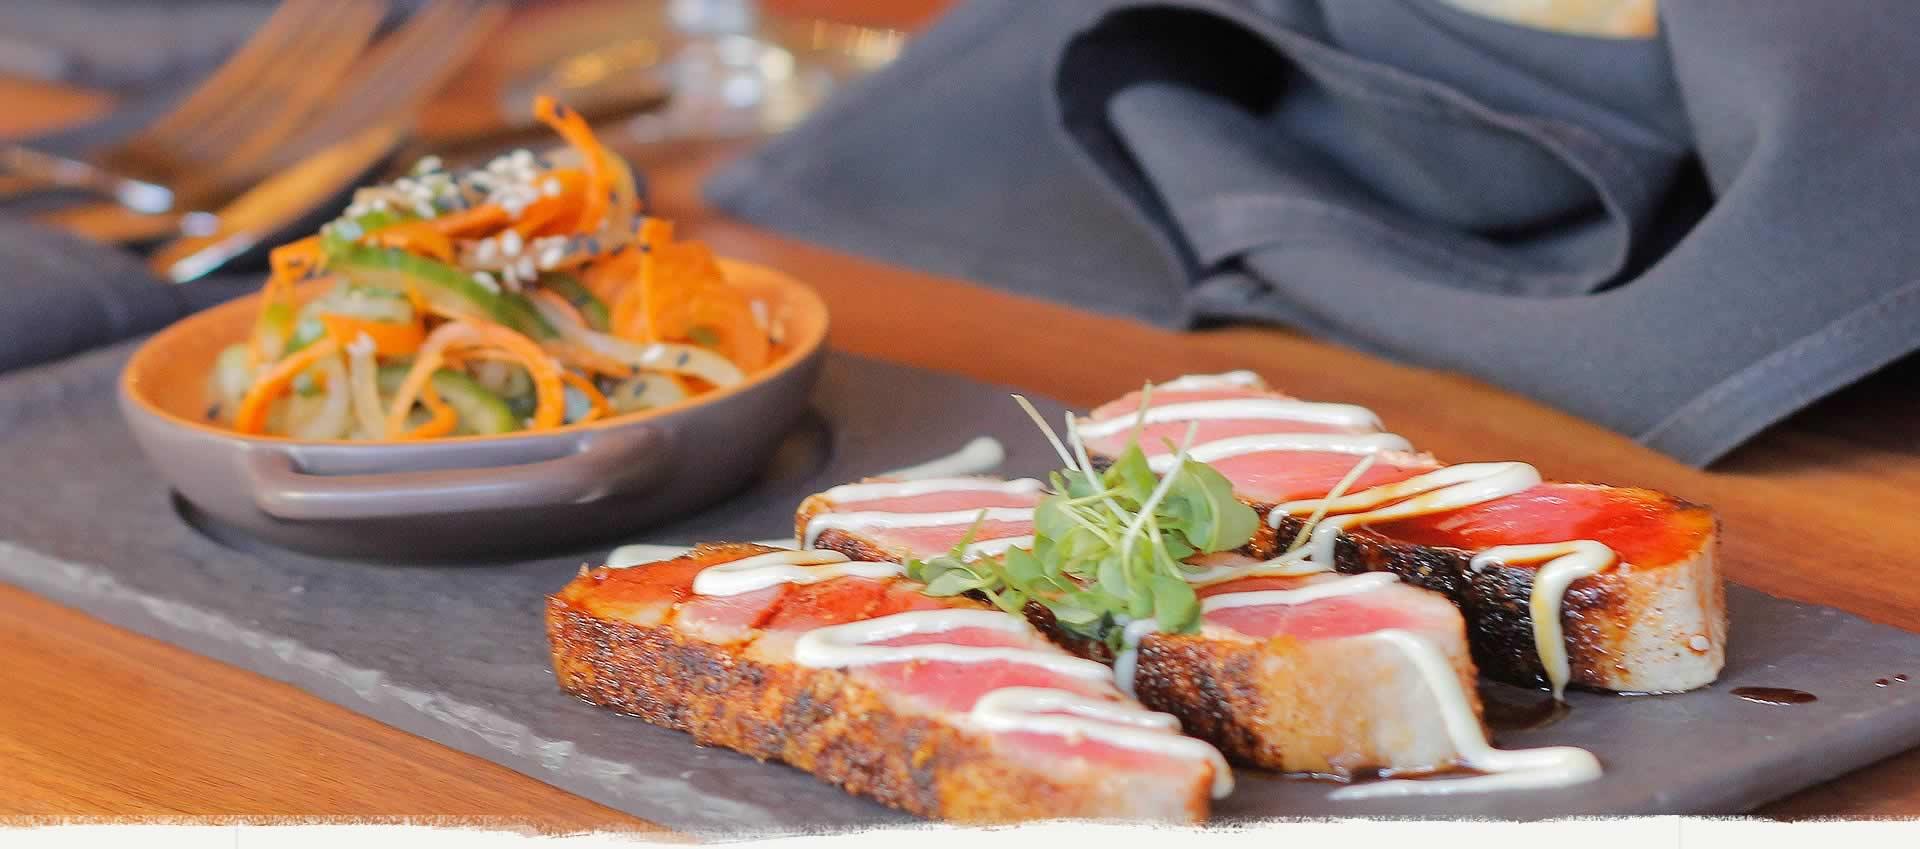 High_restaurant_food1